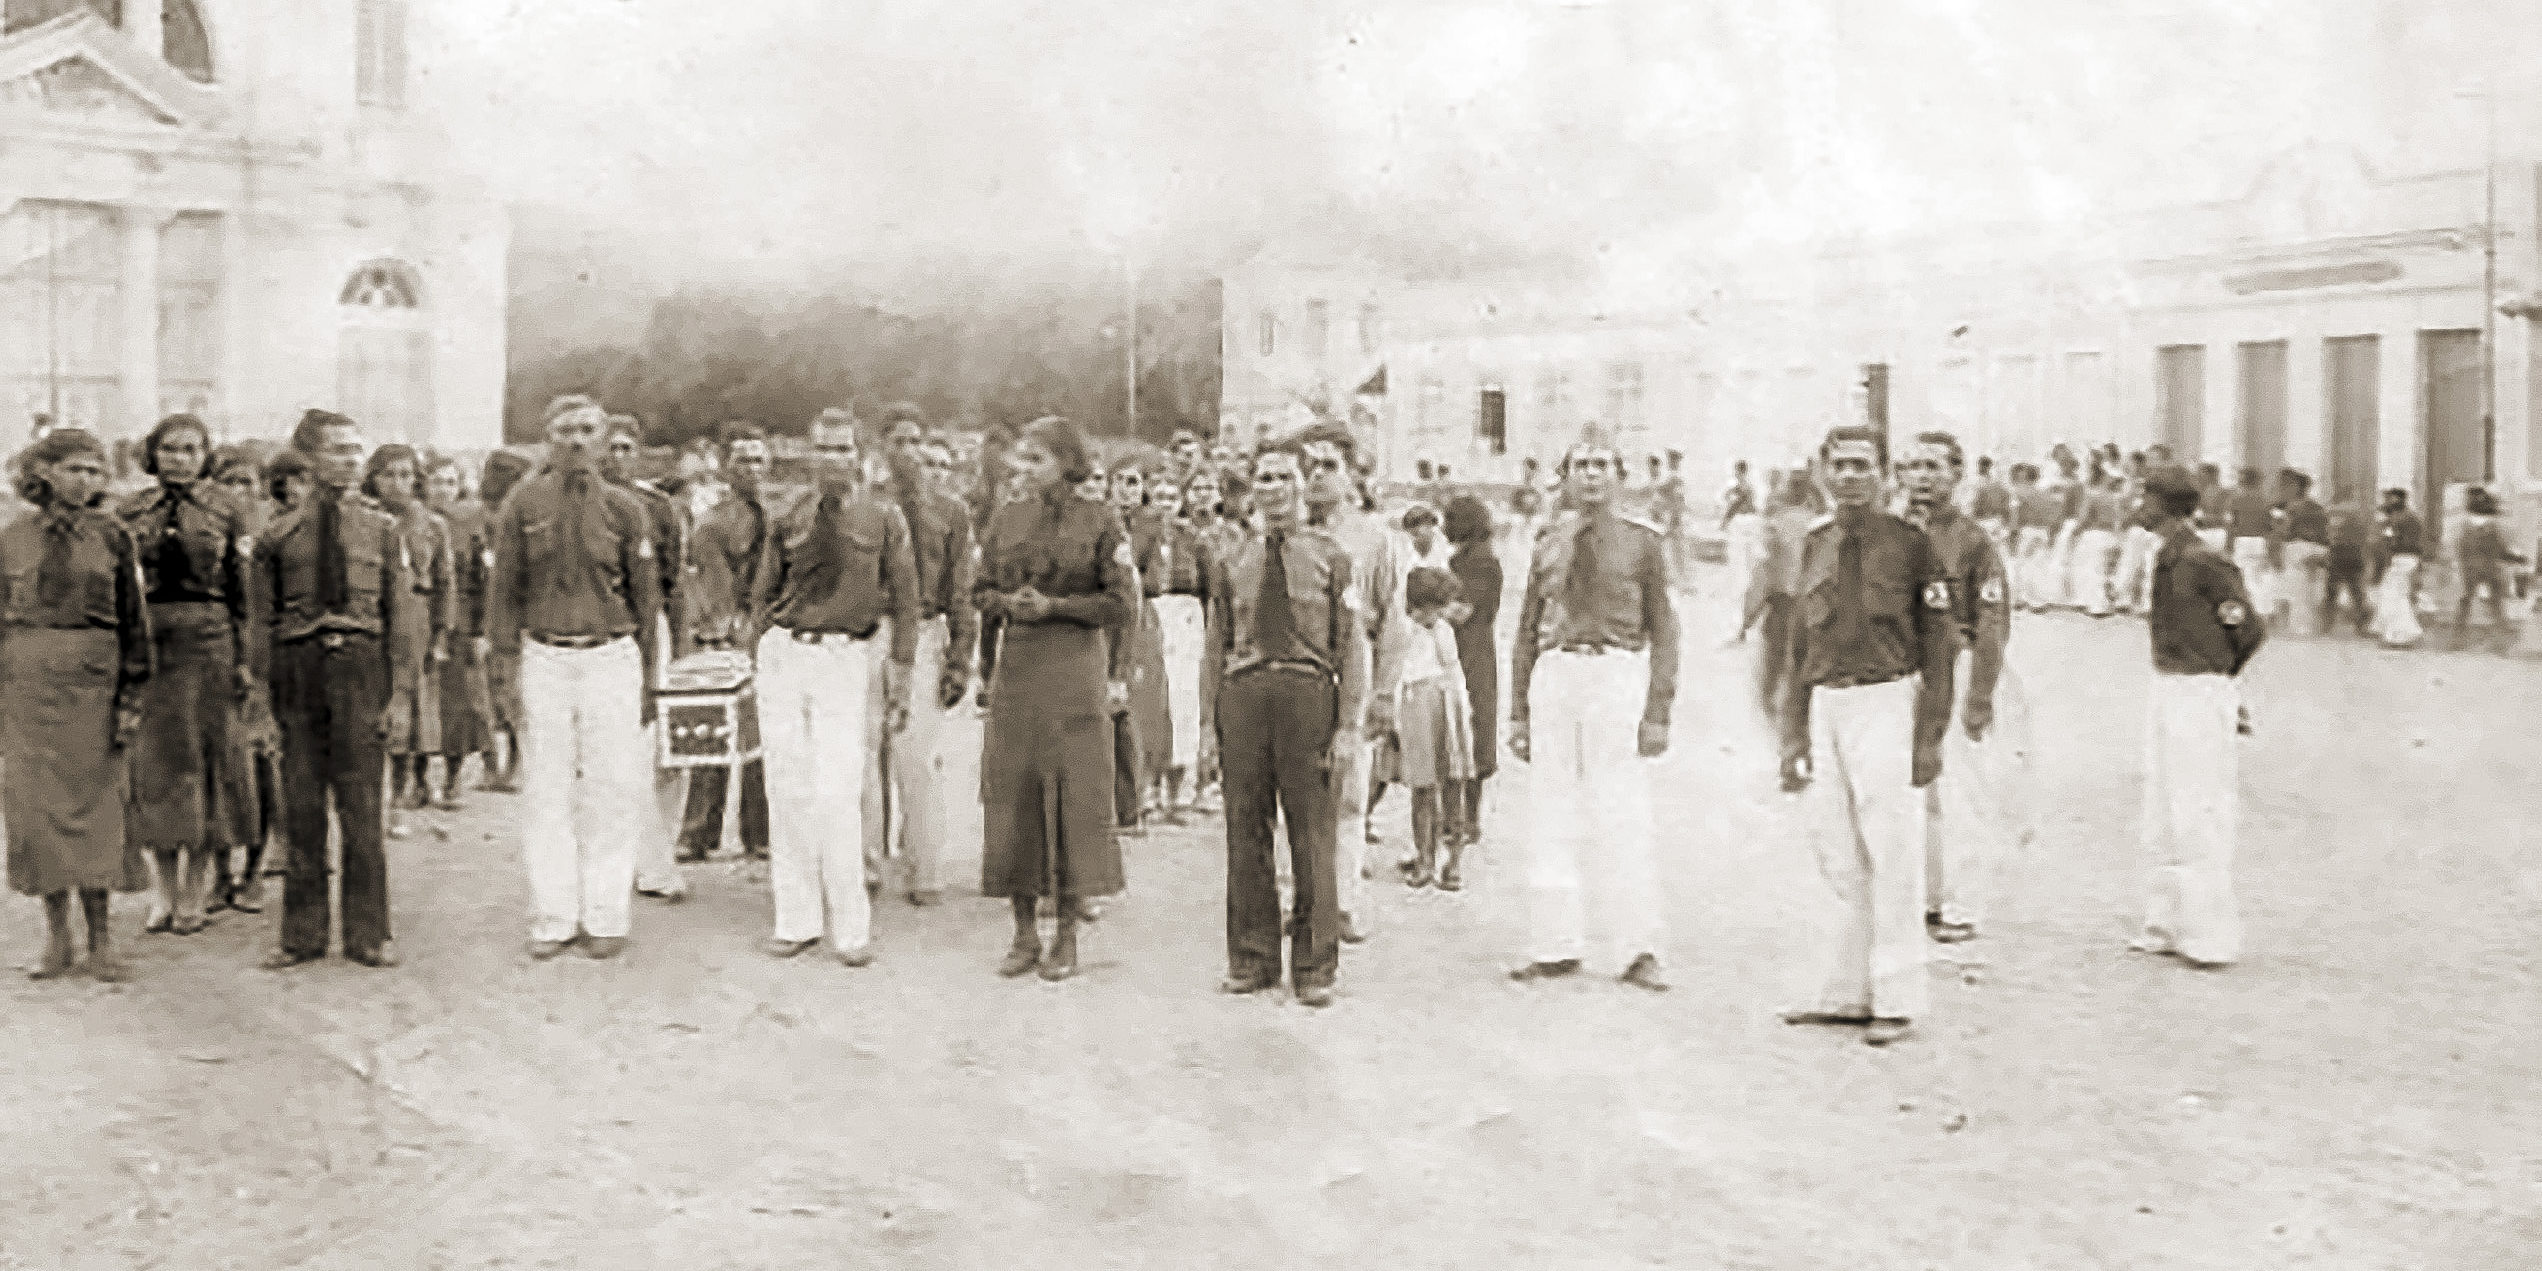 Enterro de integralista no interior de Alagoas